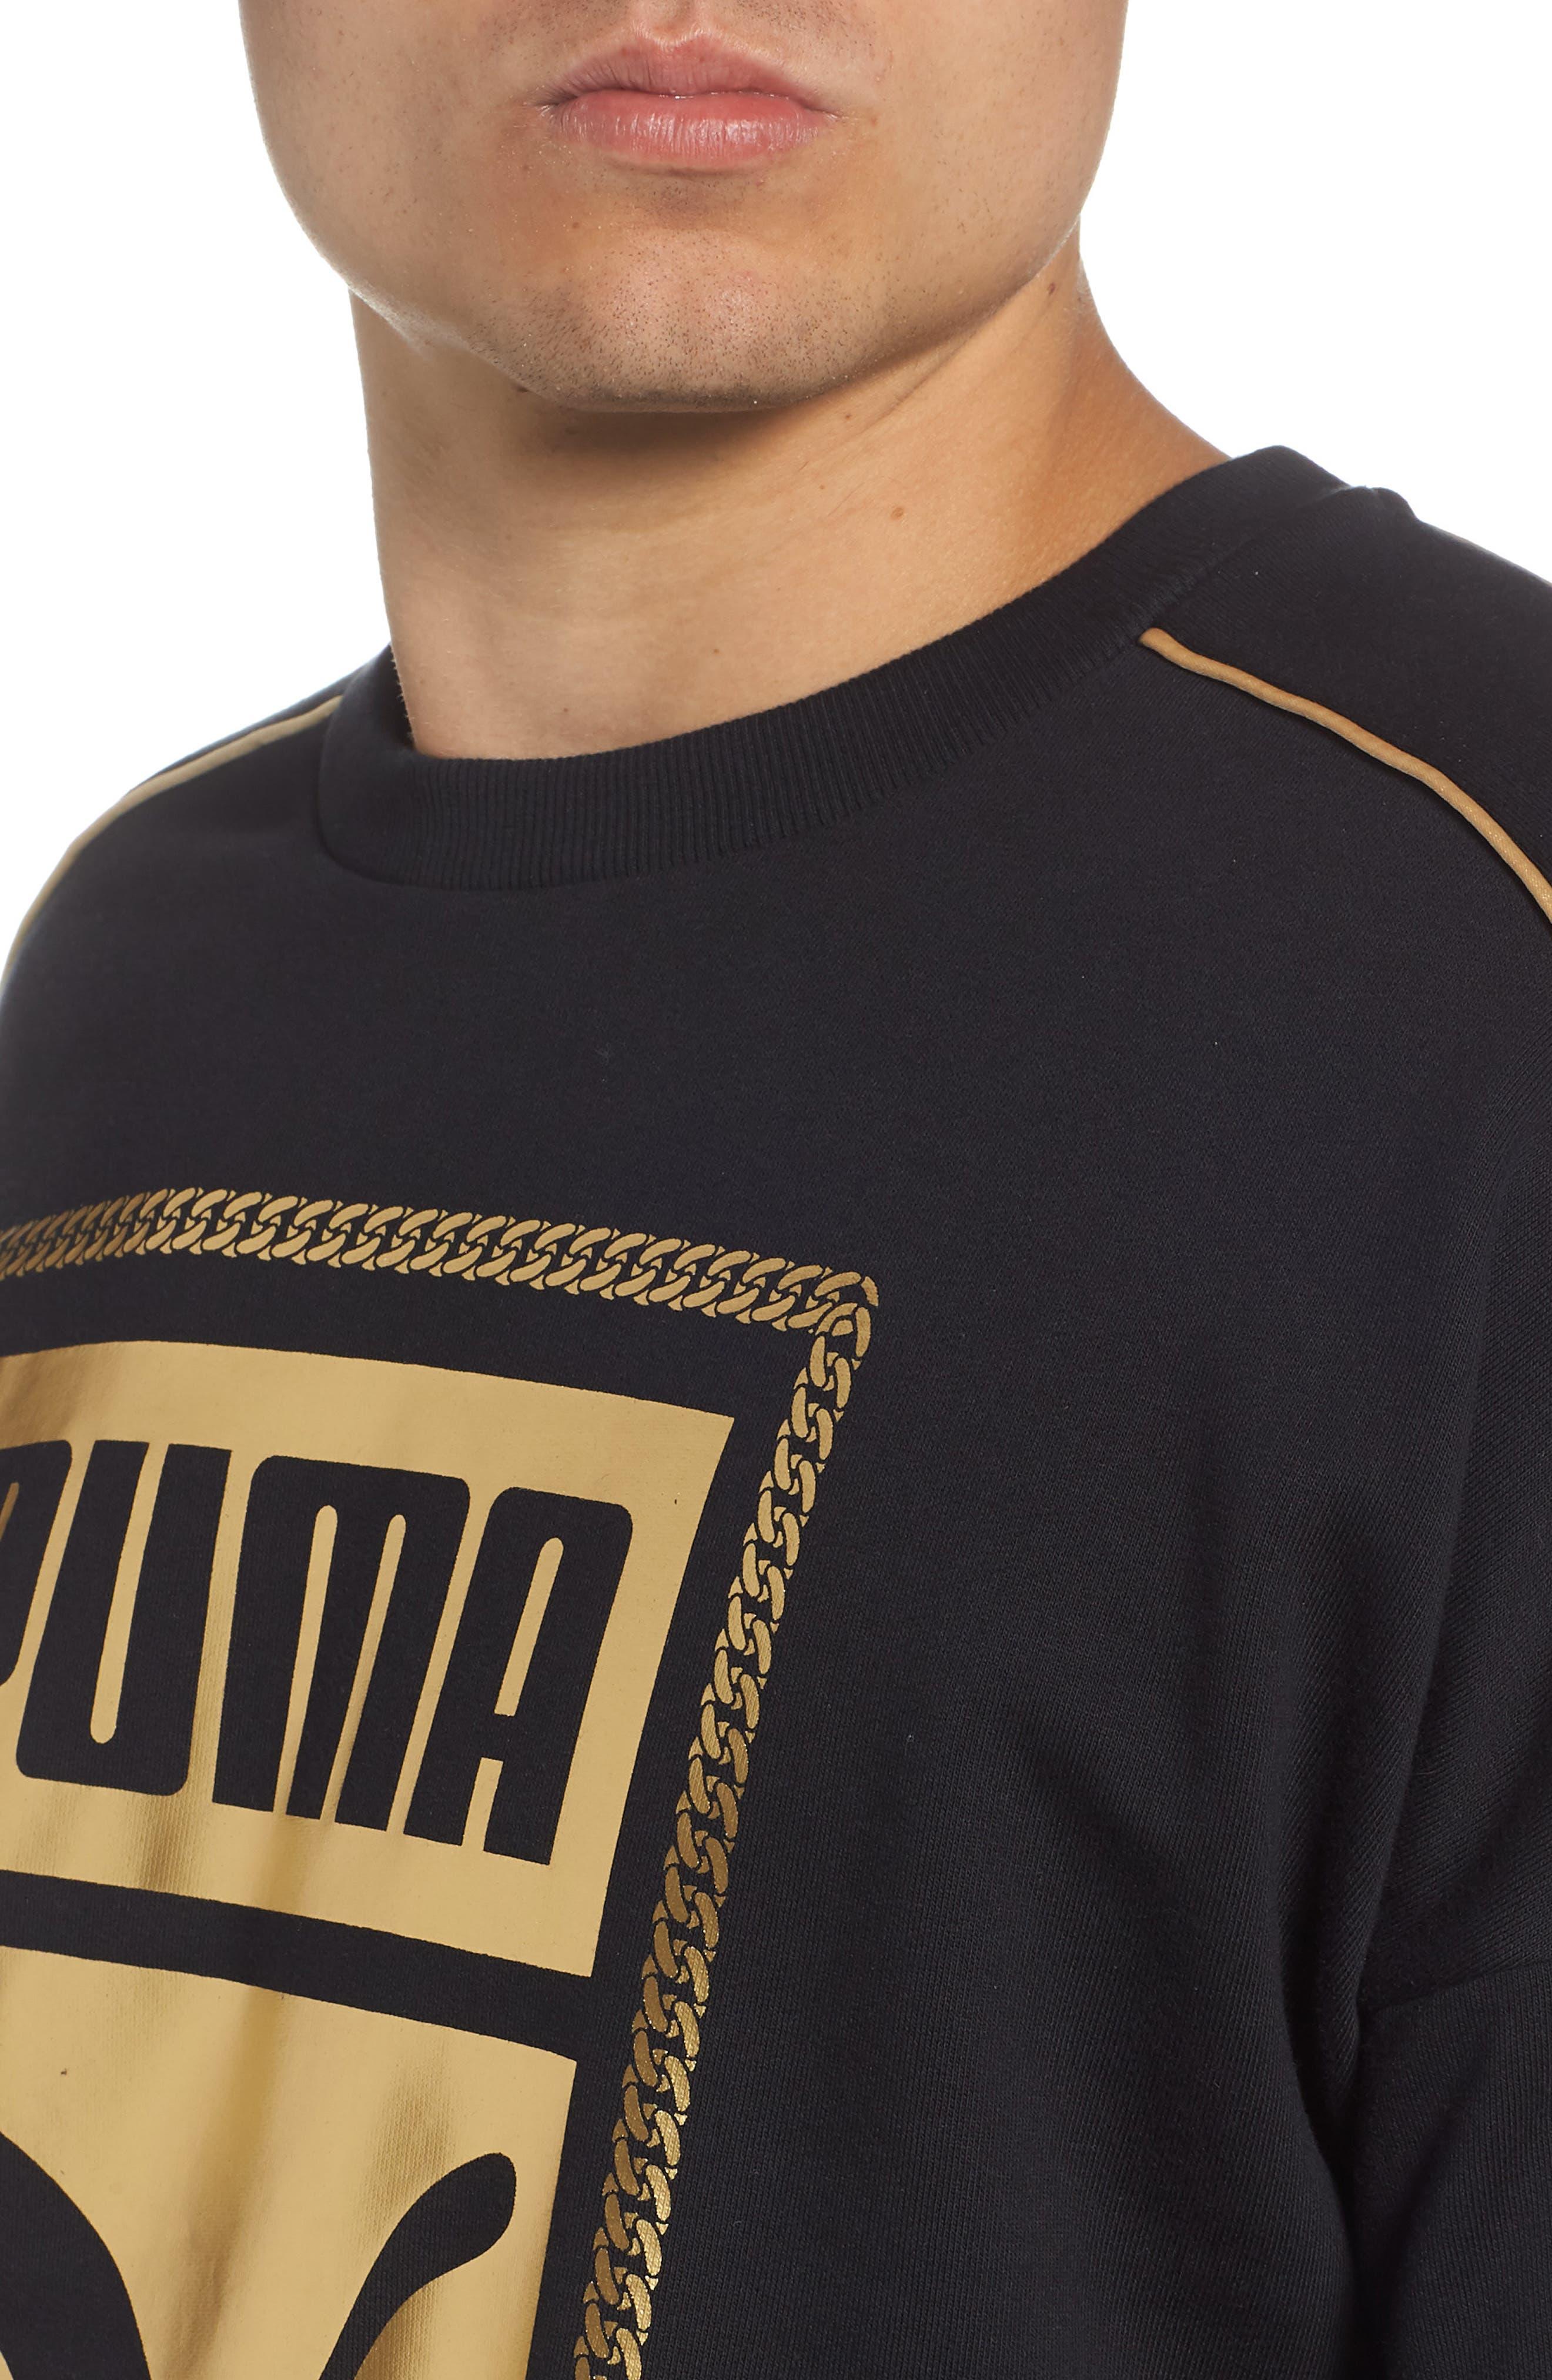 Chains Logo Graphic Sweatshirt,                             Alternate thumbnail 4, color,                             PUMA BLACK